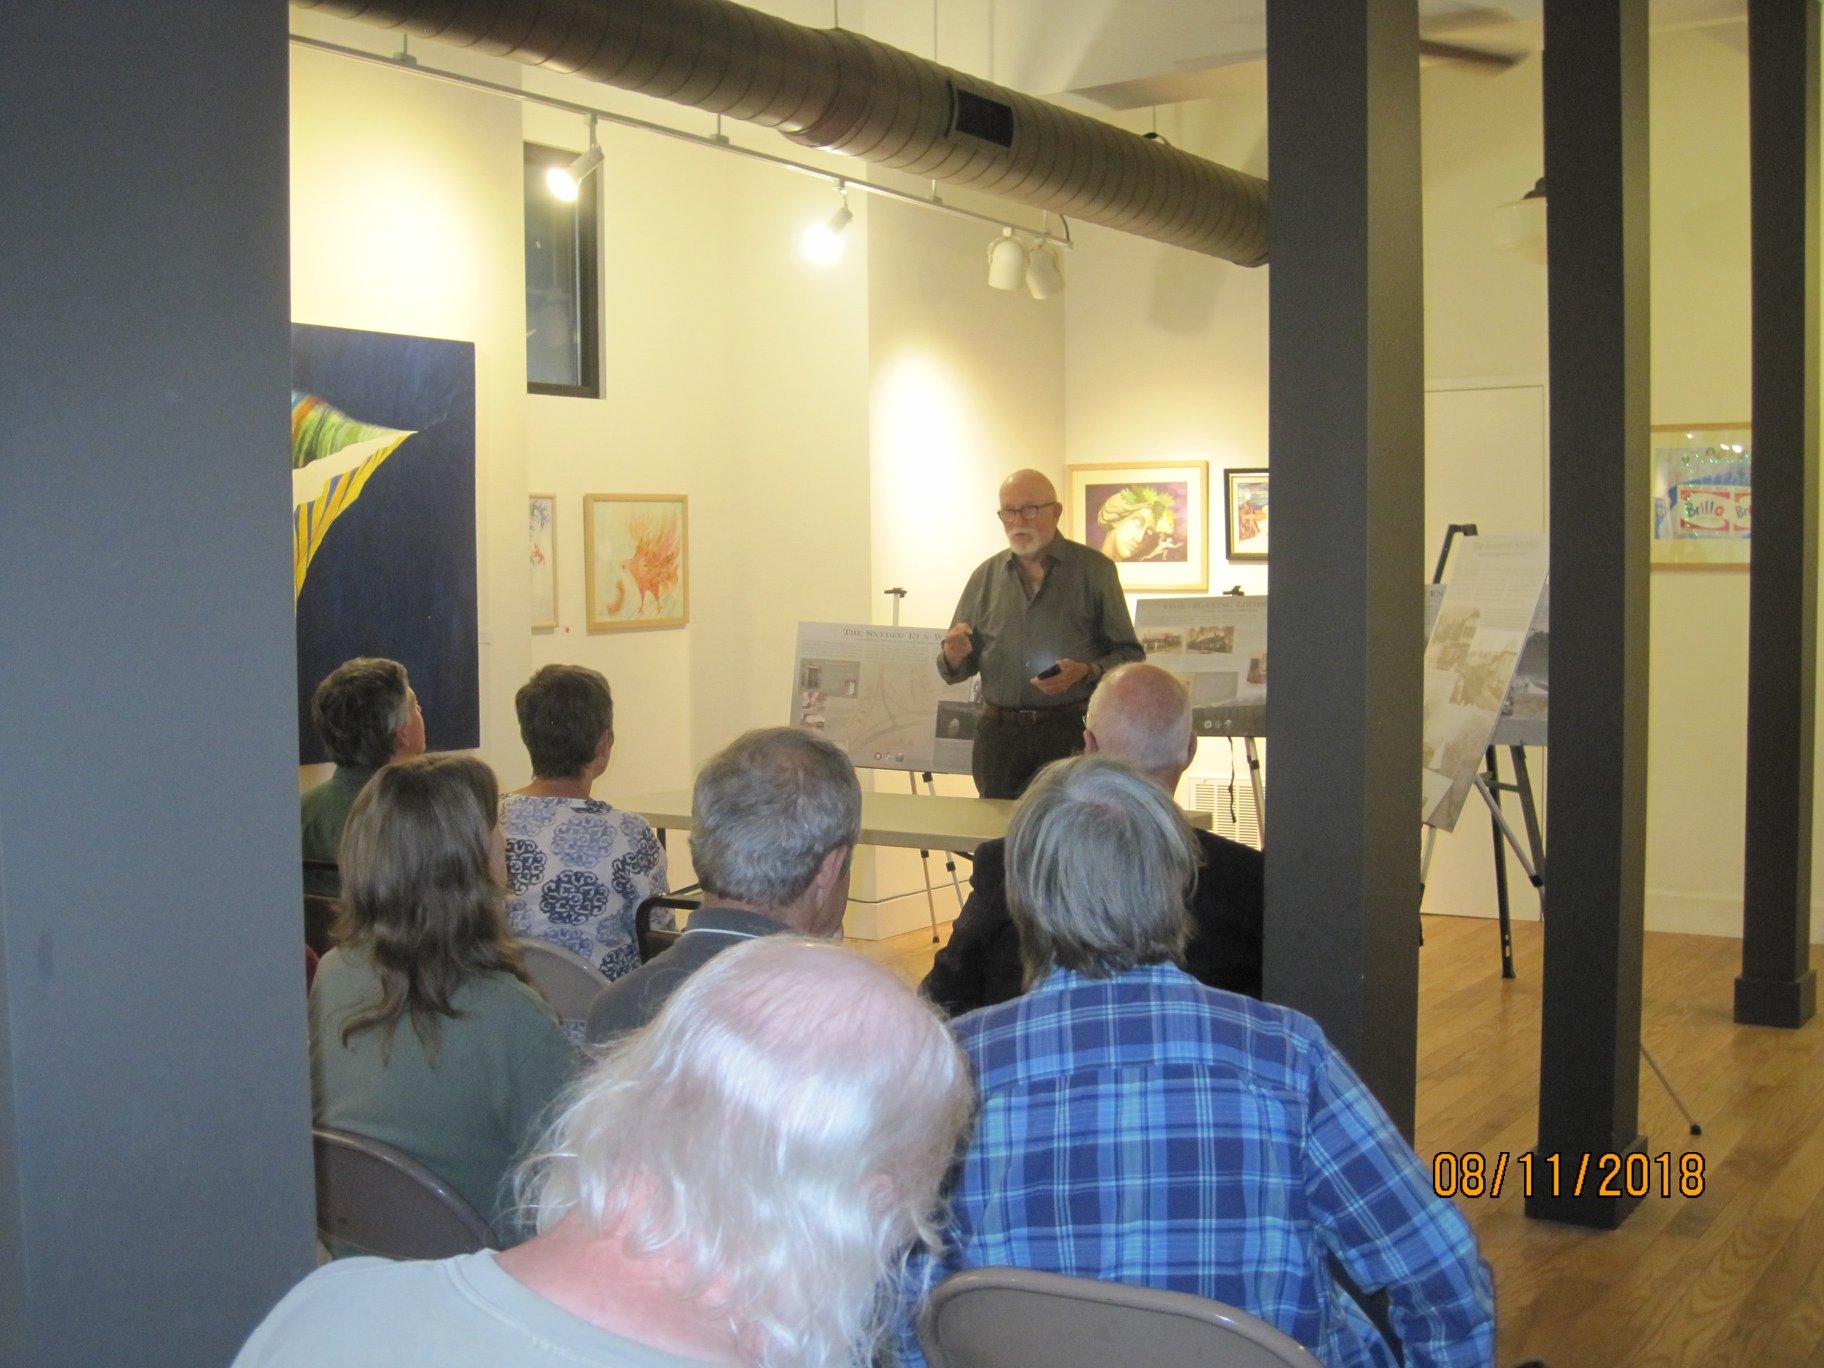 historian John Alexander Williams gives a talk